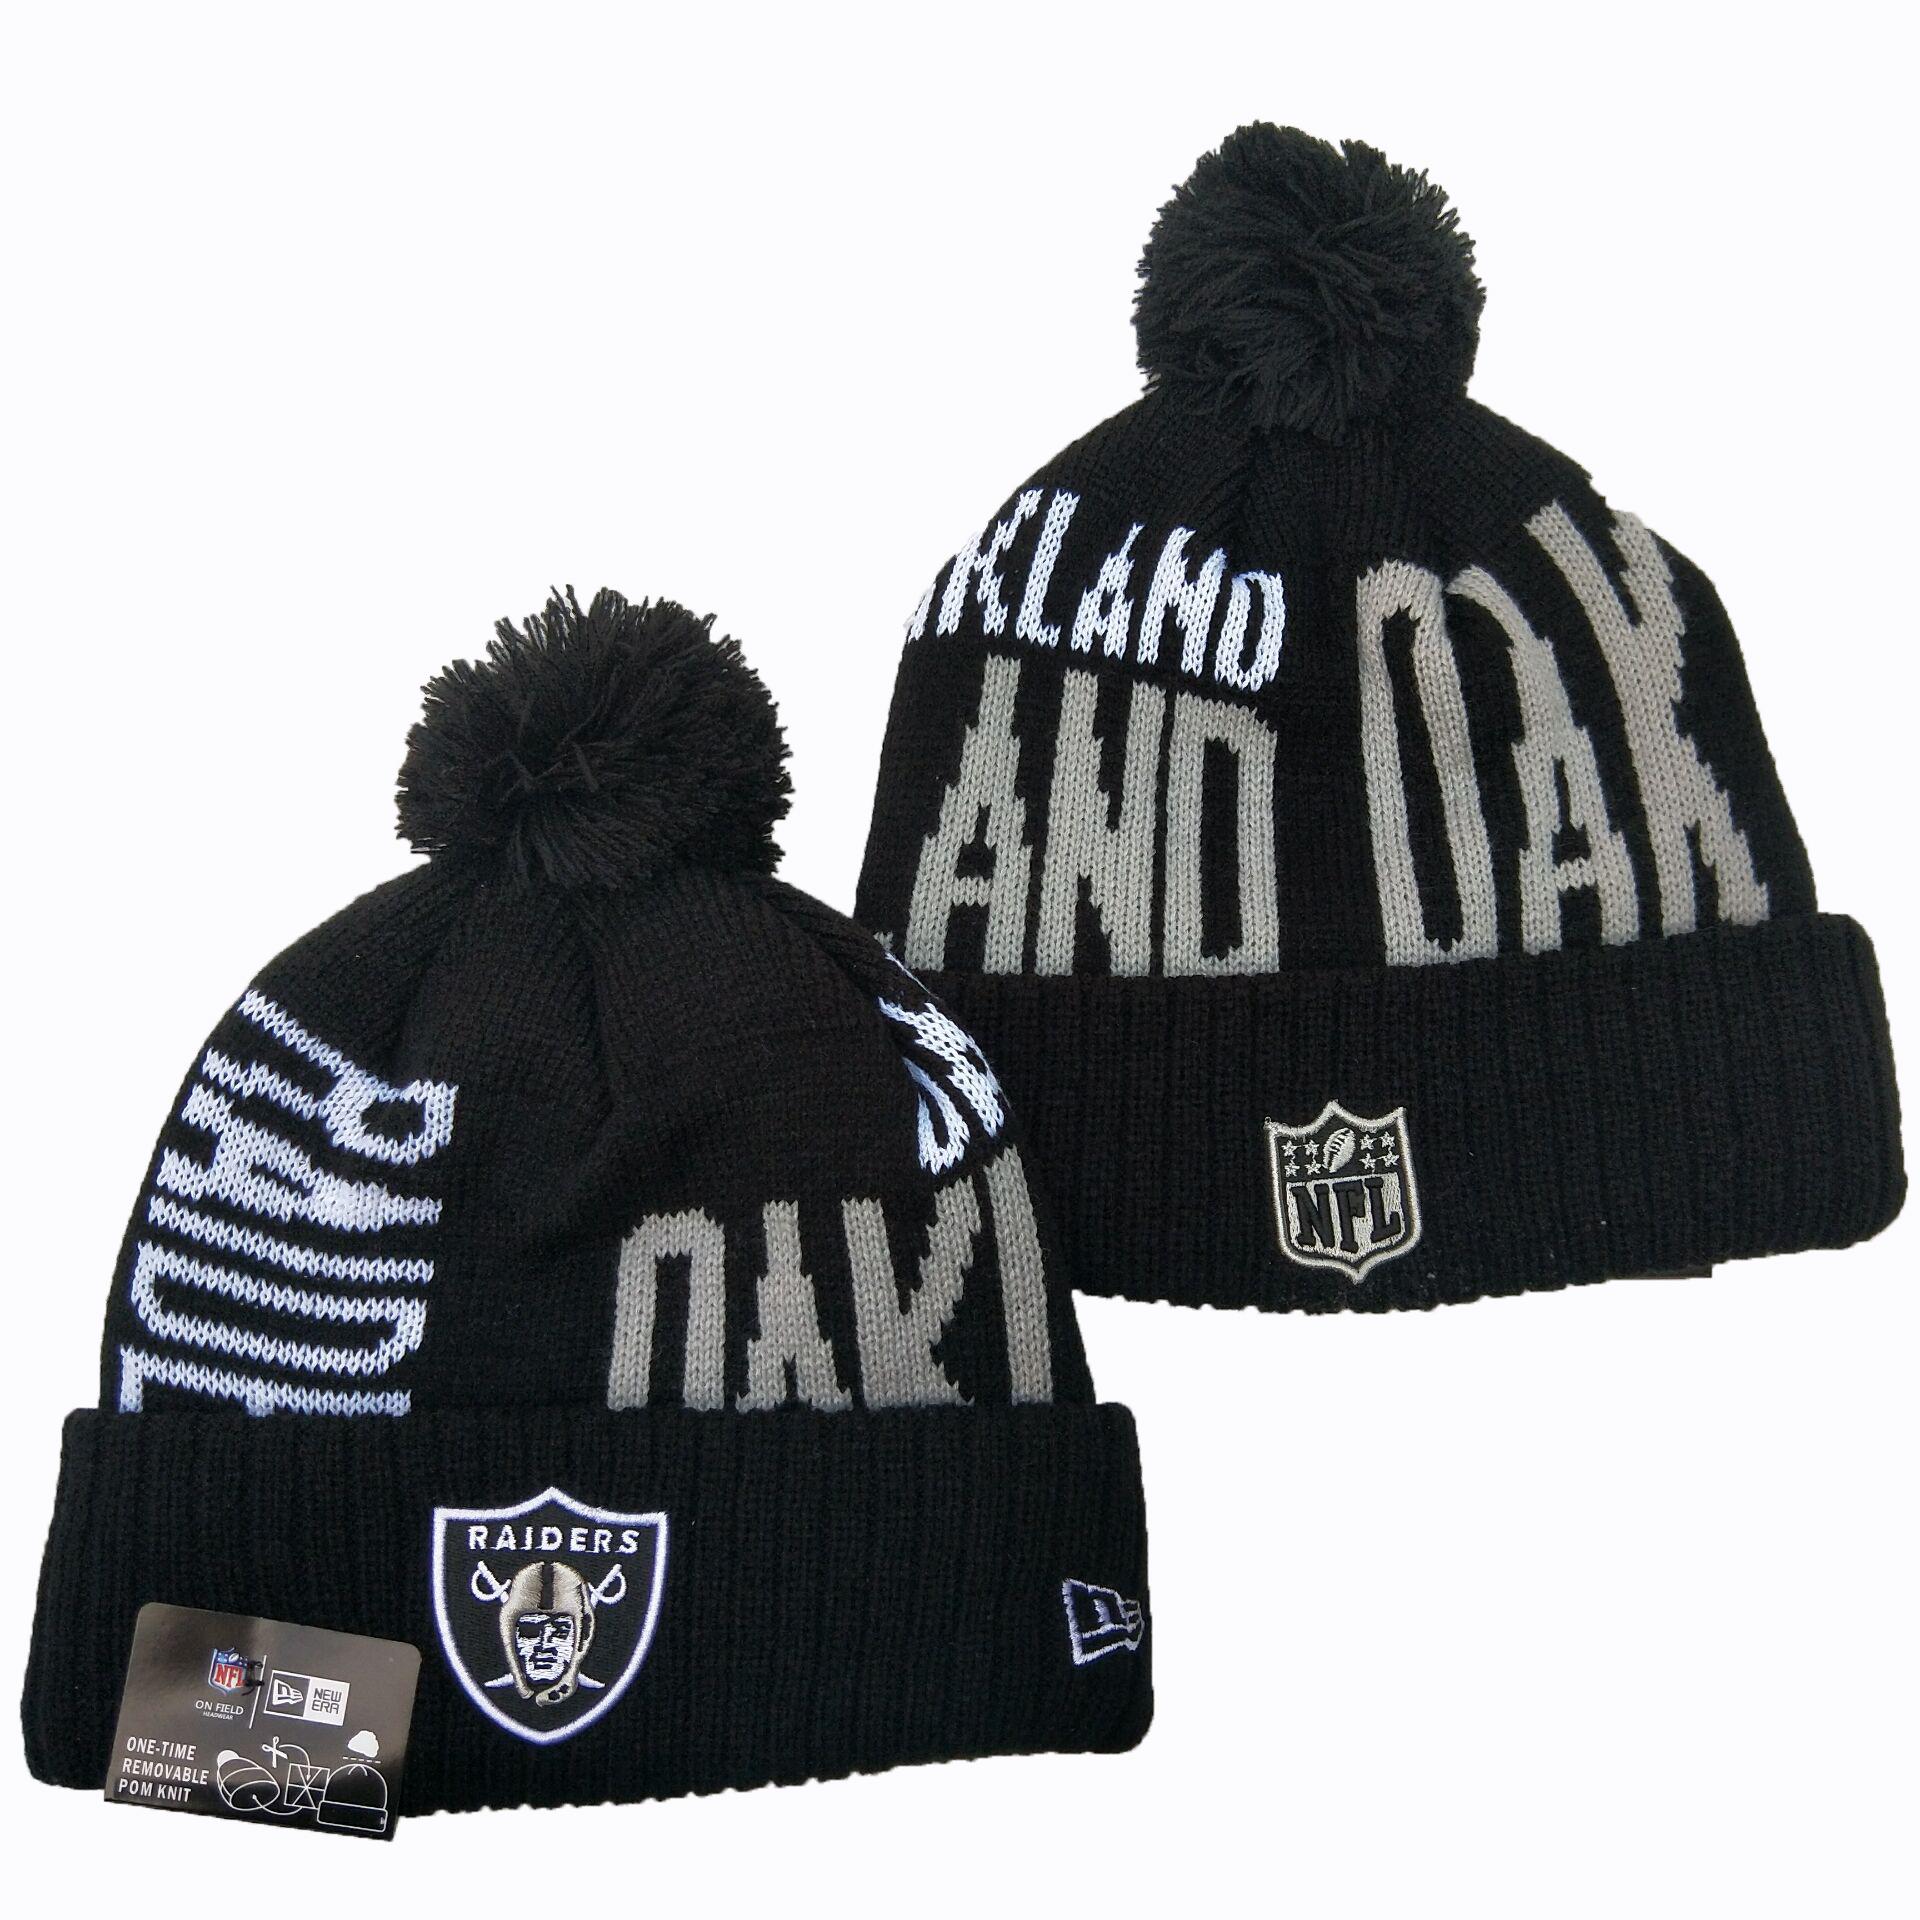 Raiders Team Logo Black Pom Knit Hat YD